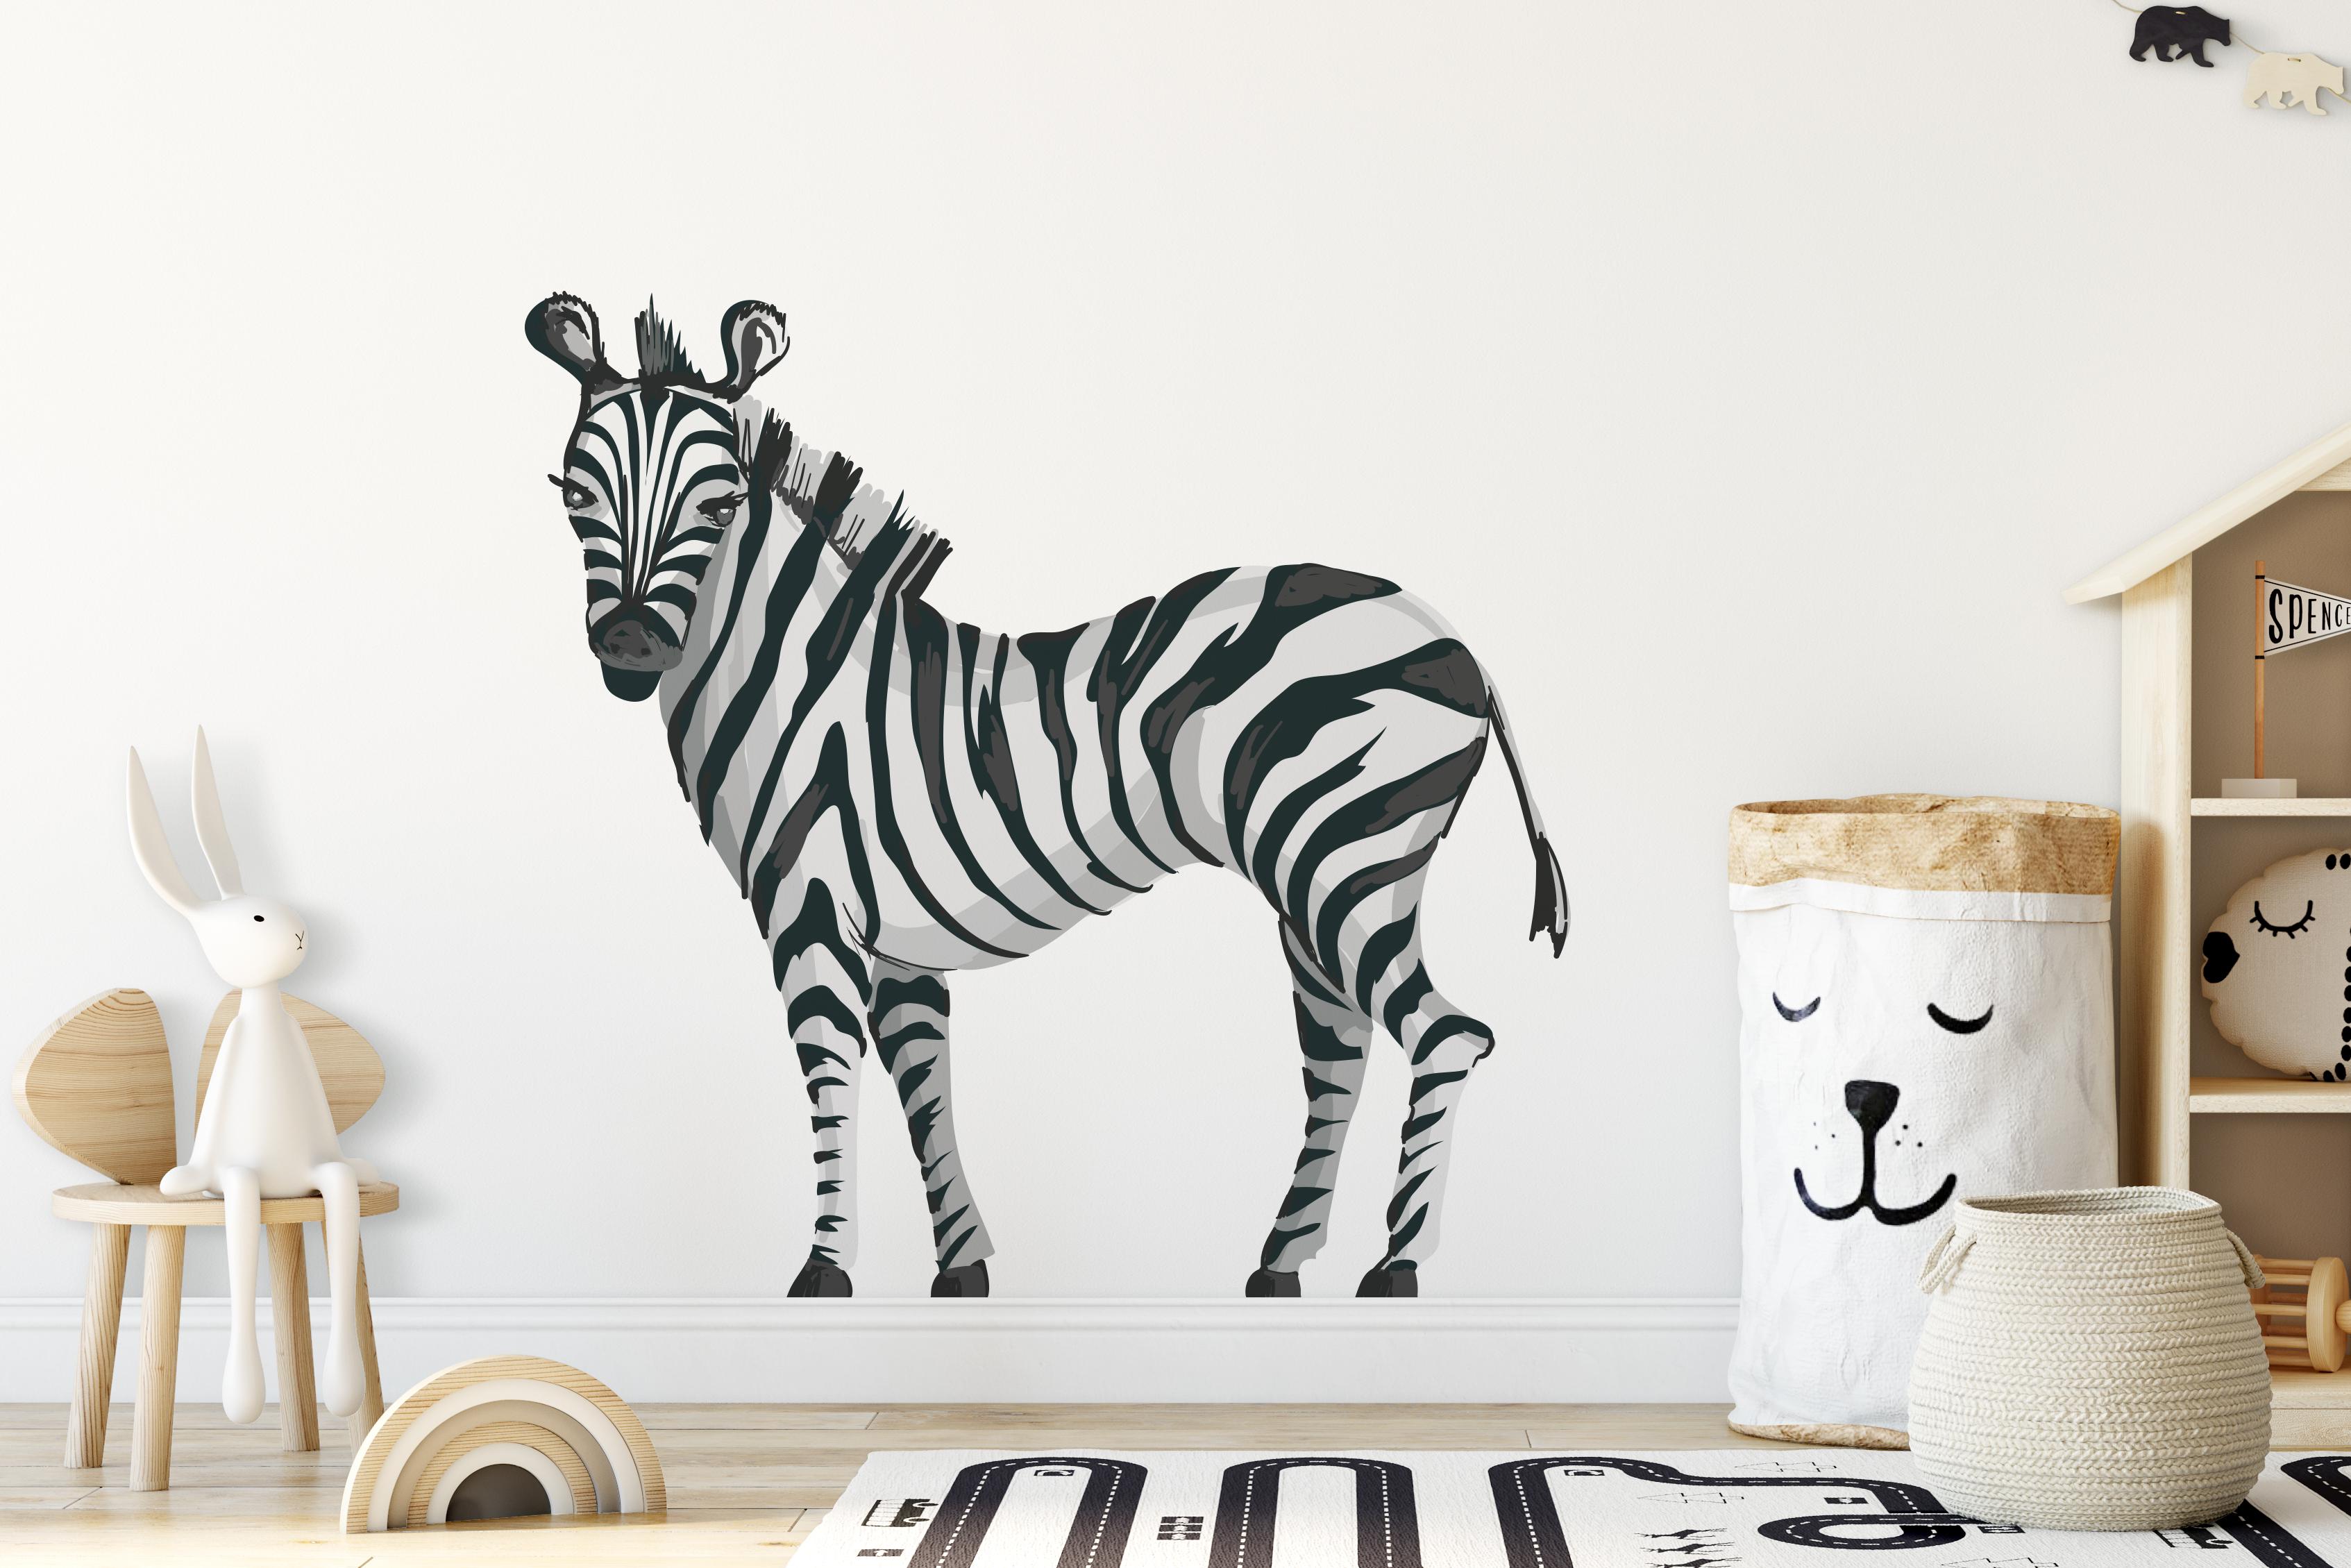 Naklejka - Zebra - fototapeta.shop